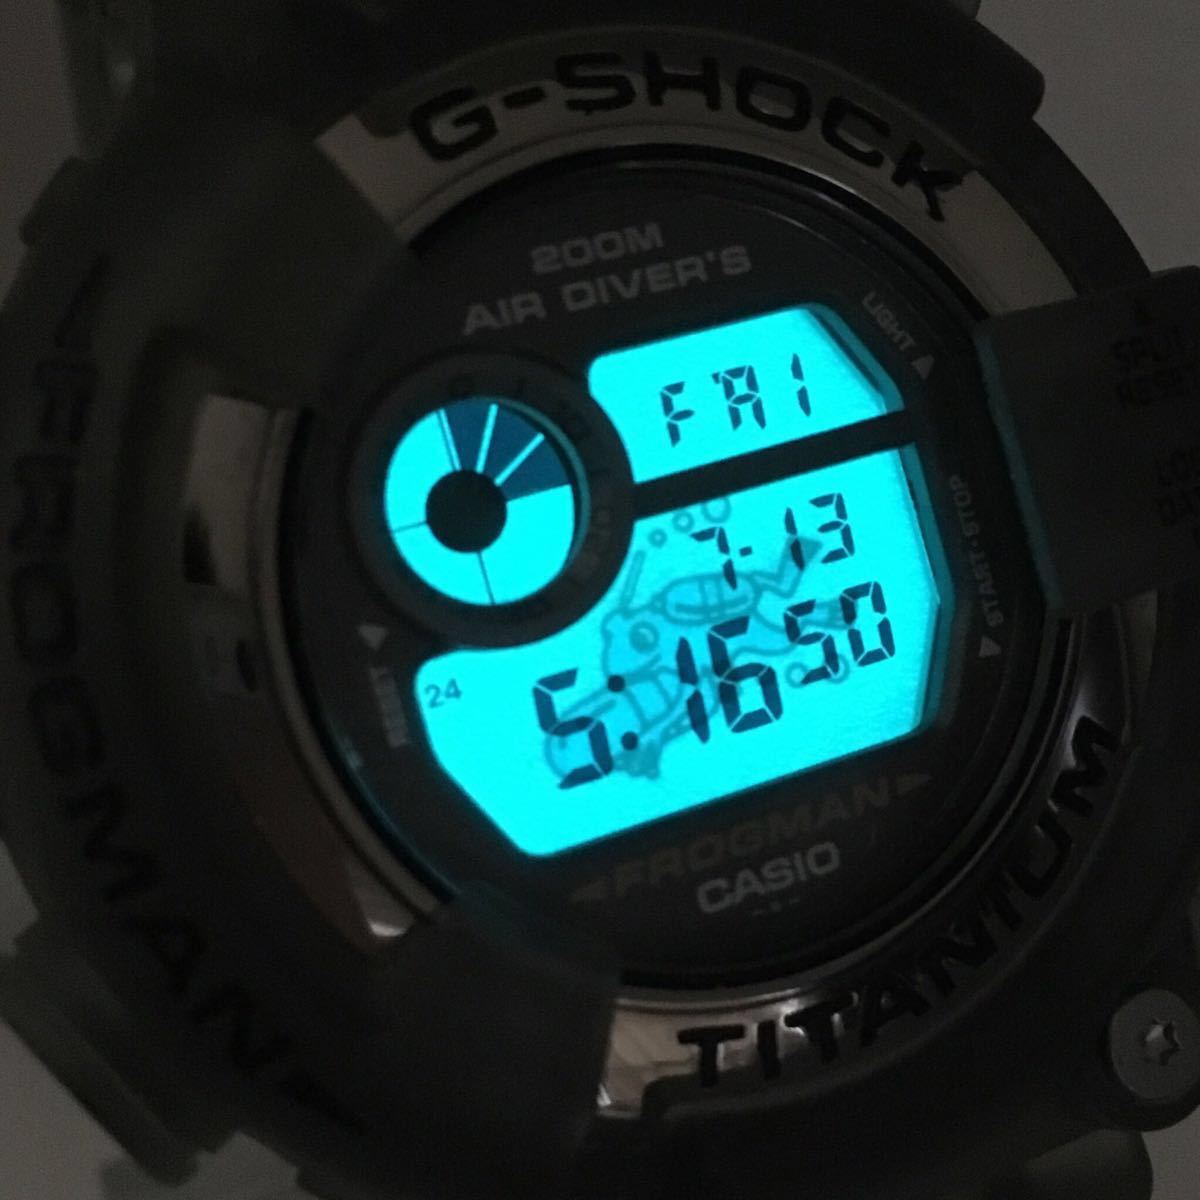 CASIO G-SHOCK DW-8200MS-8T 未使用 美品 FROGMAN フロッグマン MEN IN SMOKE メン・イン・スモーク 潜水蛙 箱タグ付き Gショック_画像9